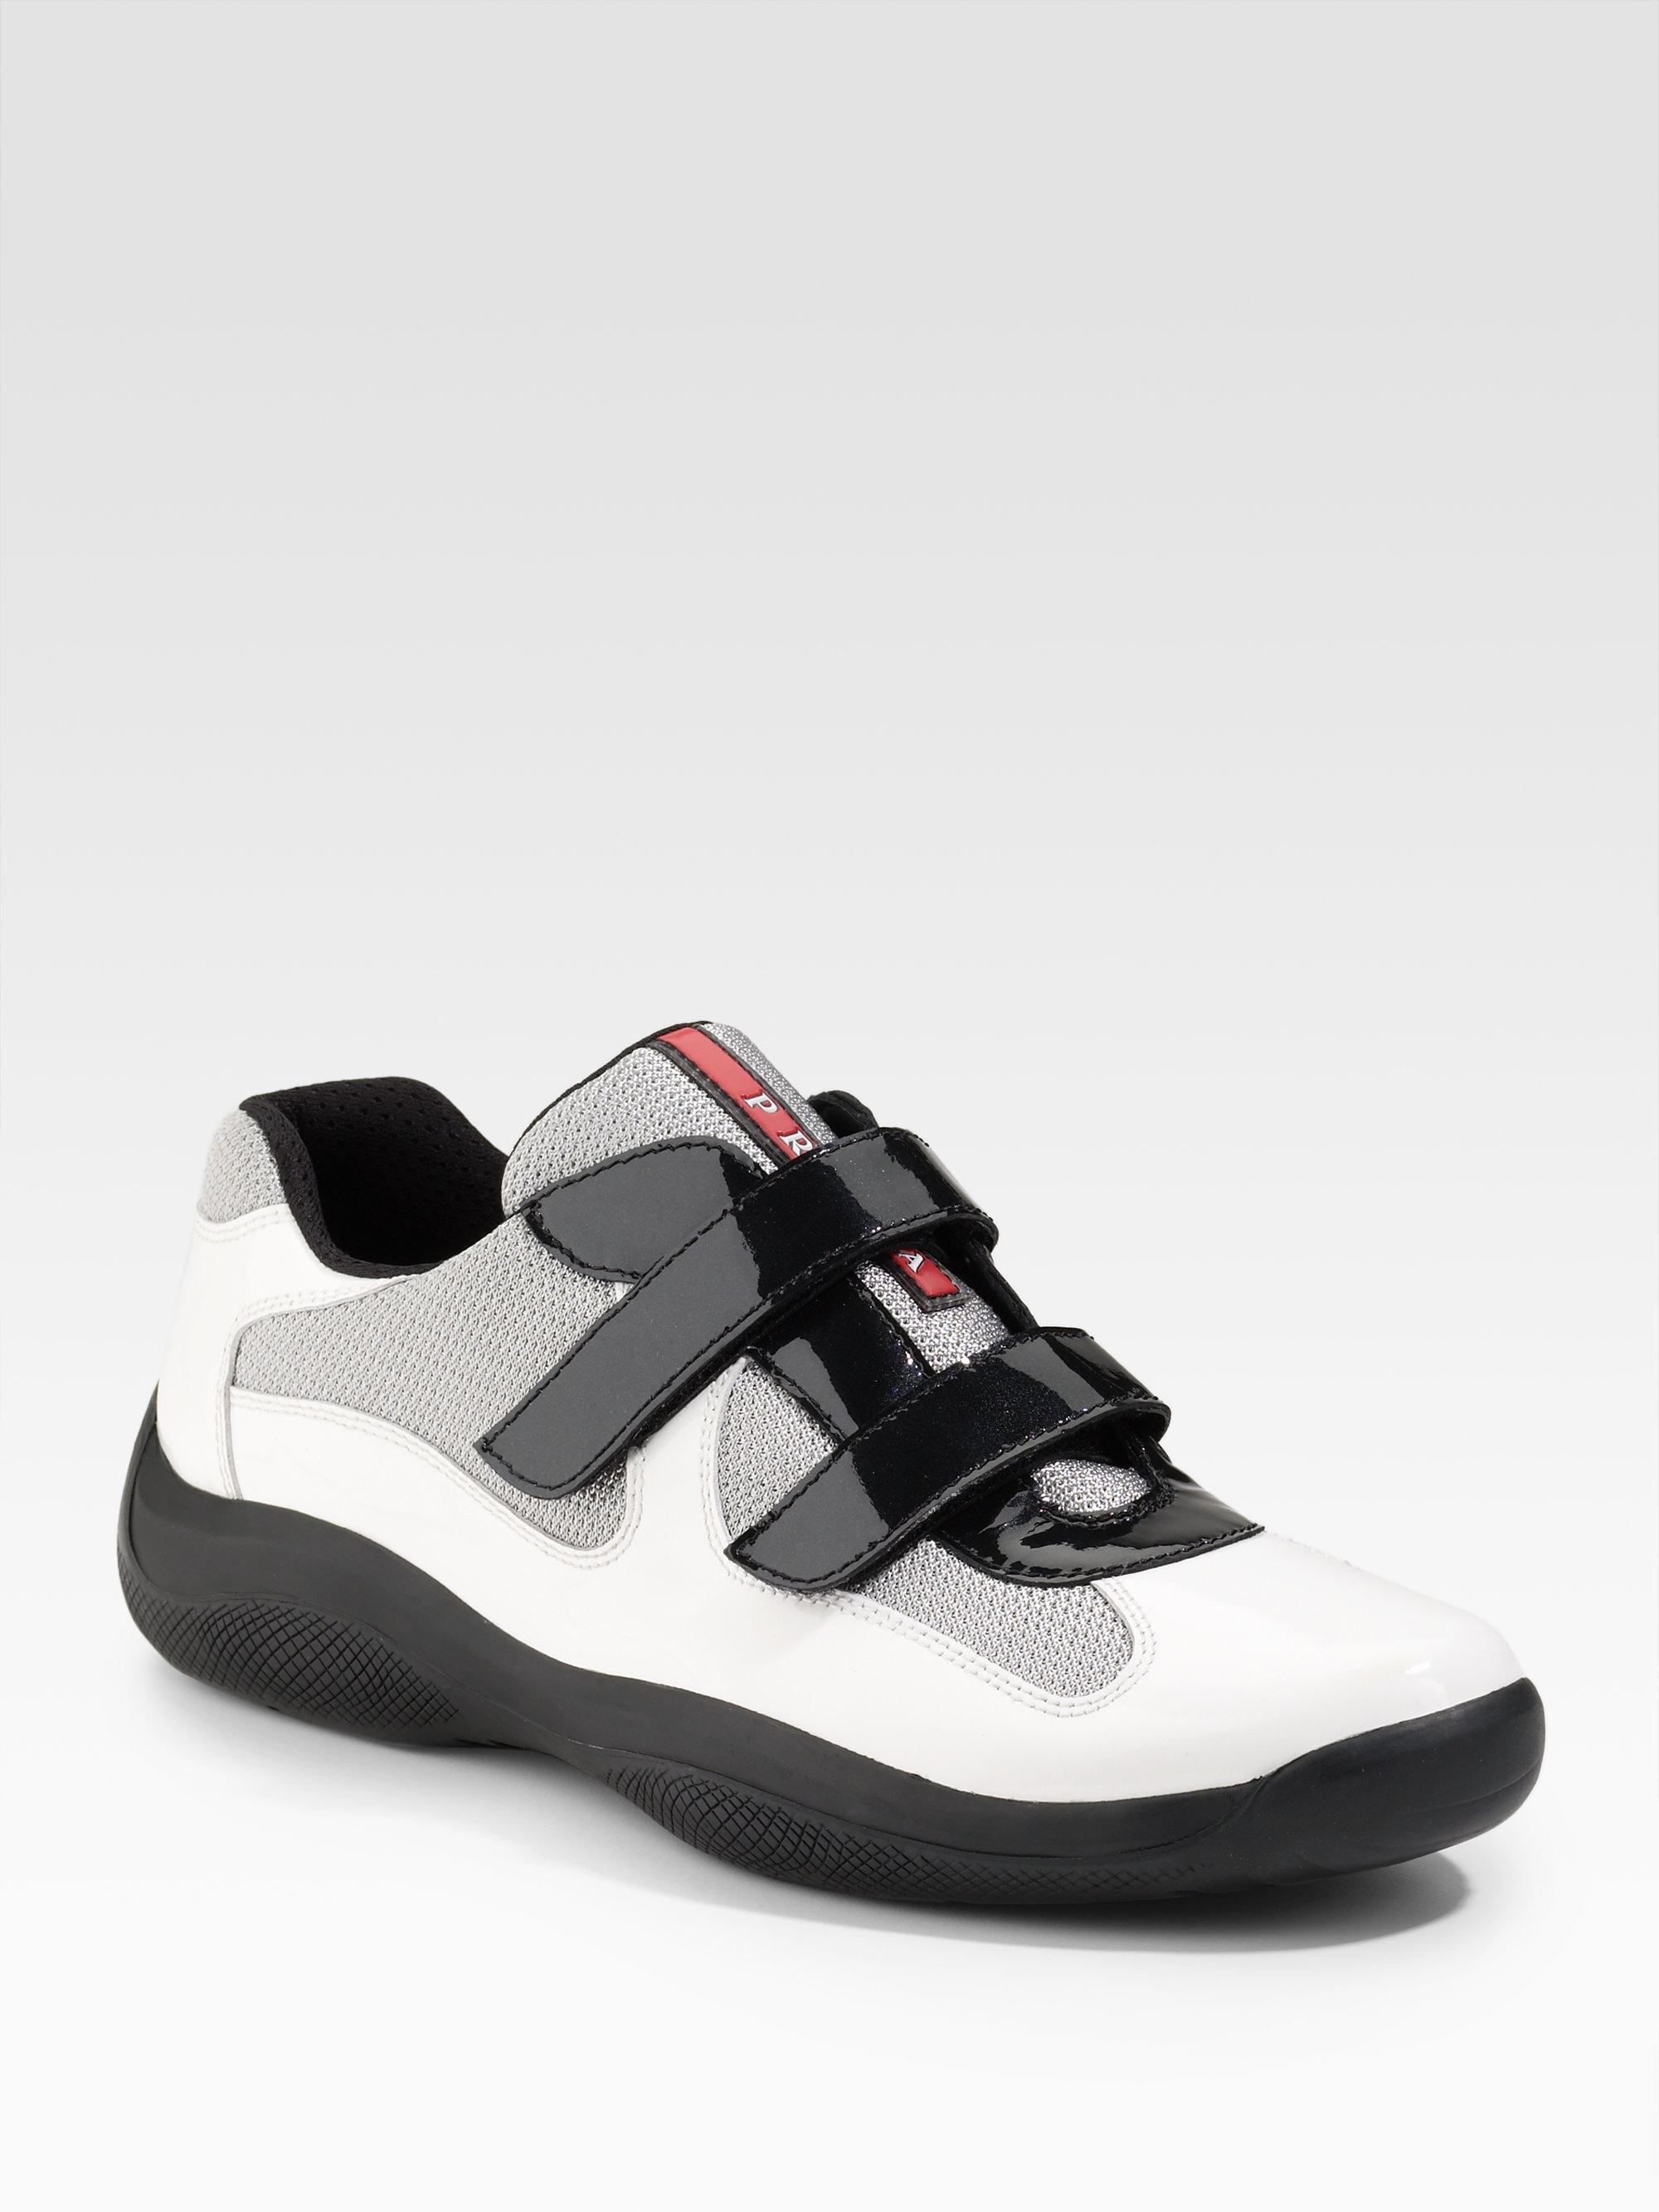 c1d1d7e1c75c Lyst - Prada Double-strap Sneakers in White for Men